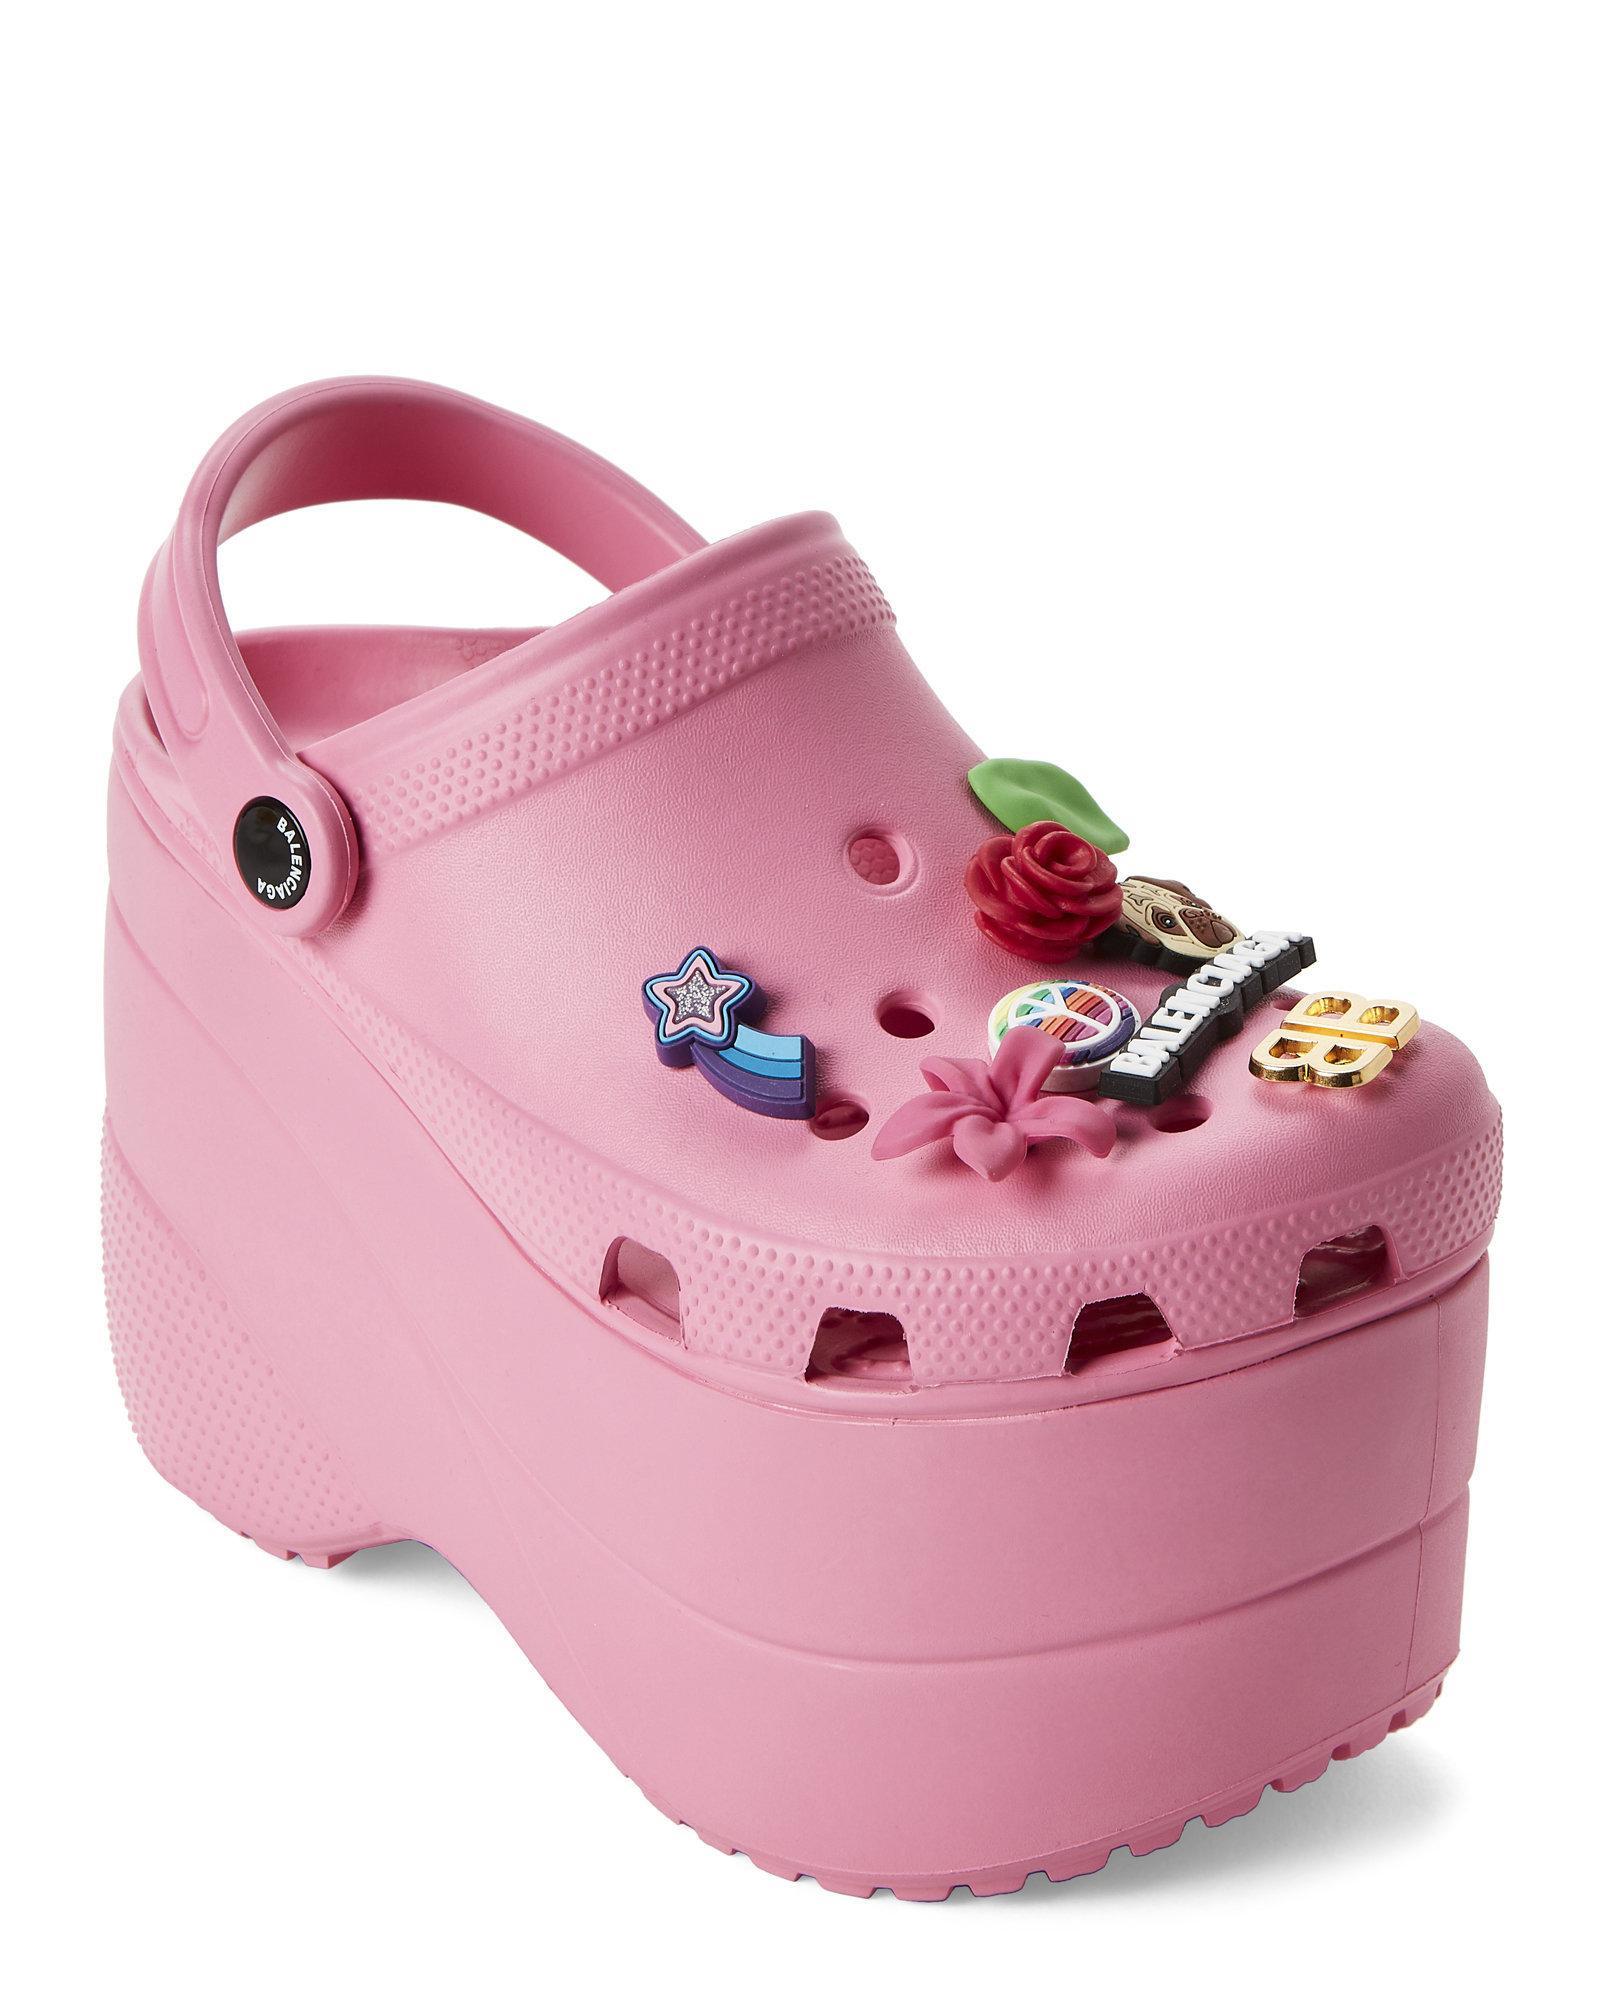 2dc092dbeed Lyst - Balenciaga Rose Bonbon Foam Platform Sandals in Pink